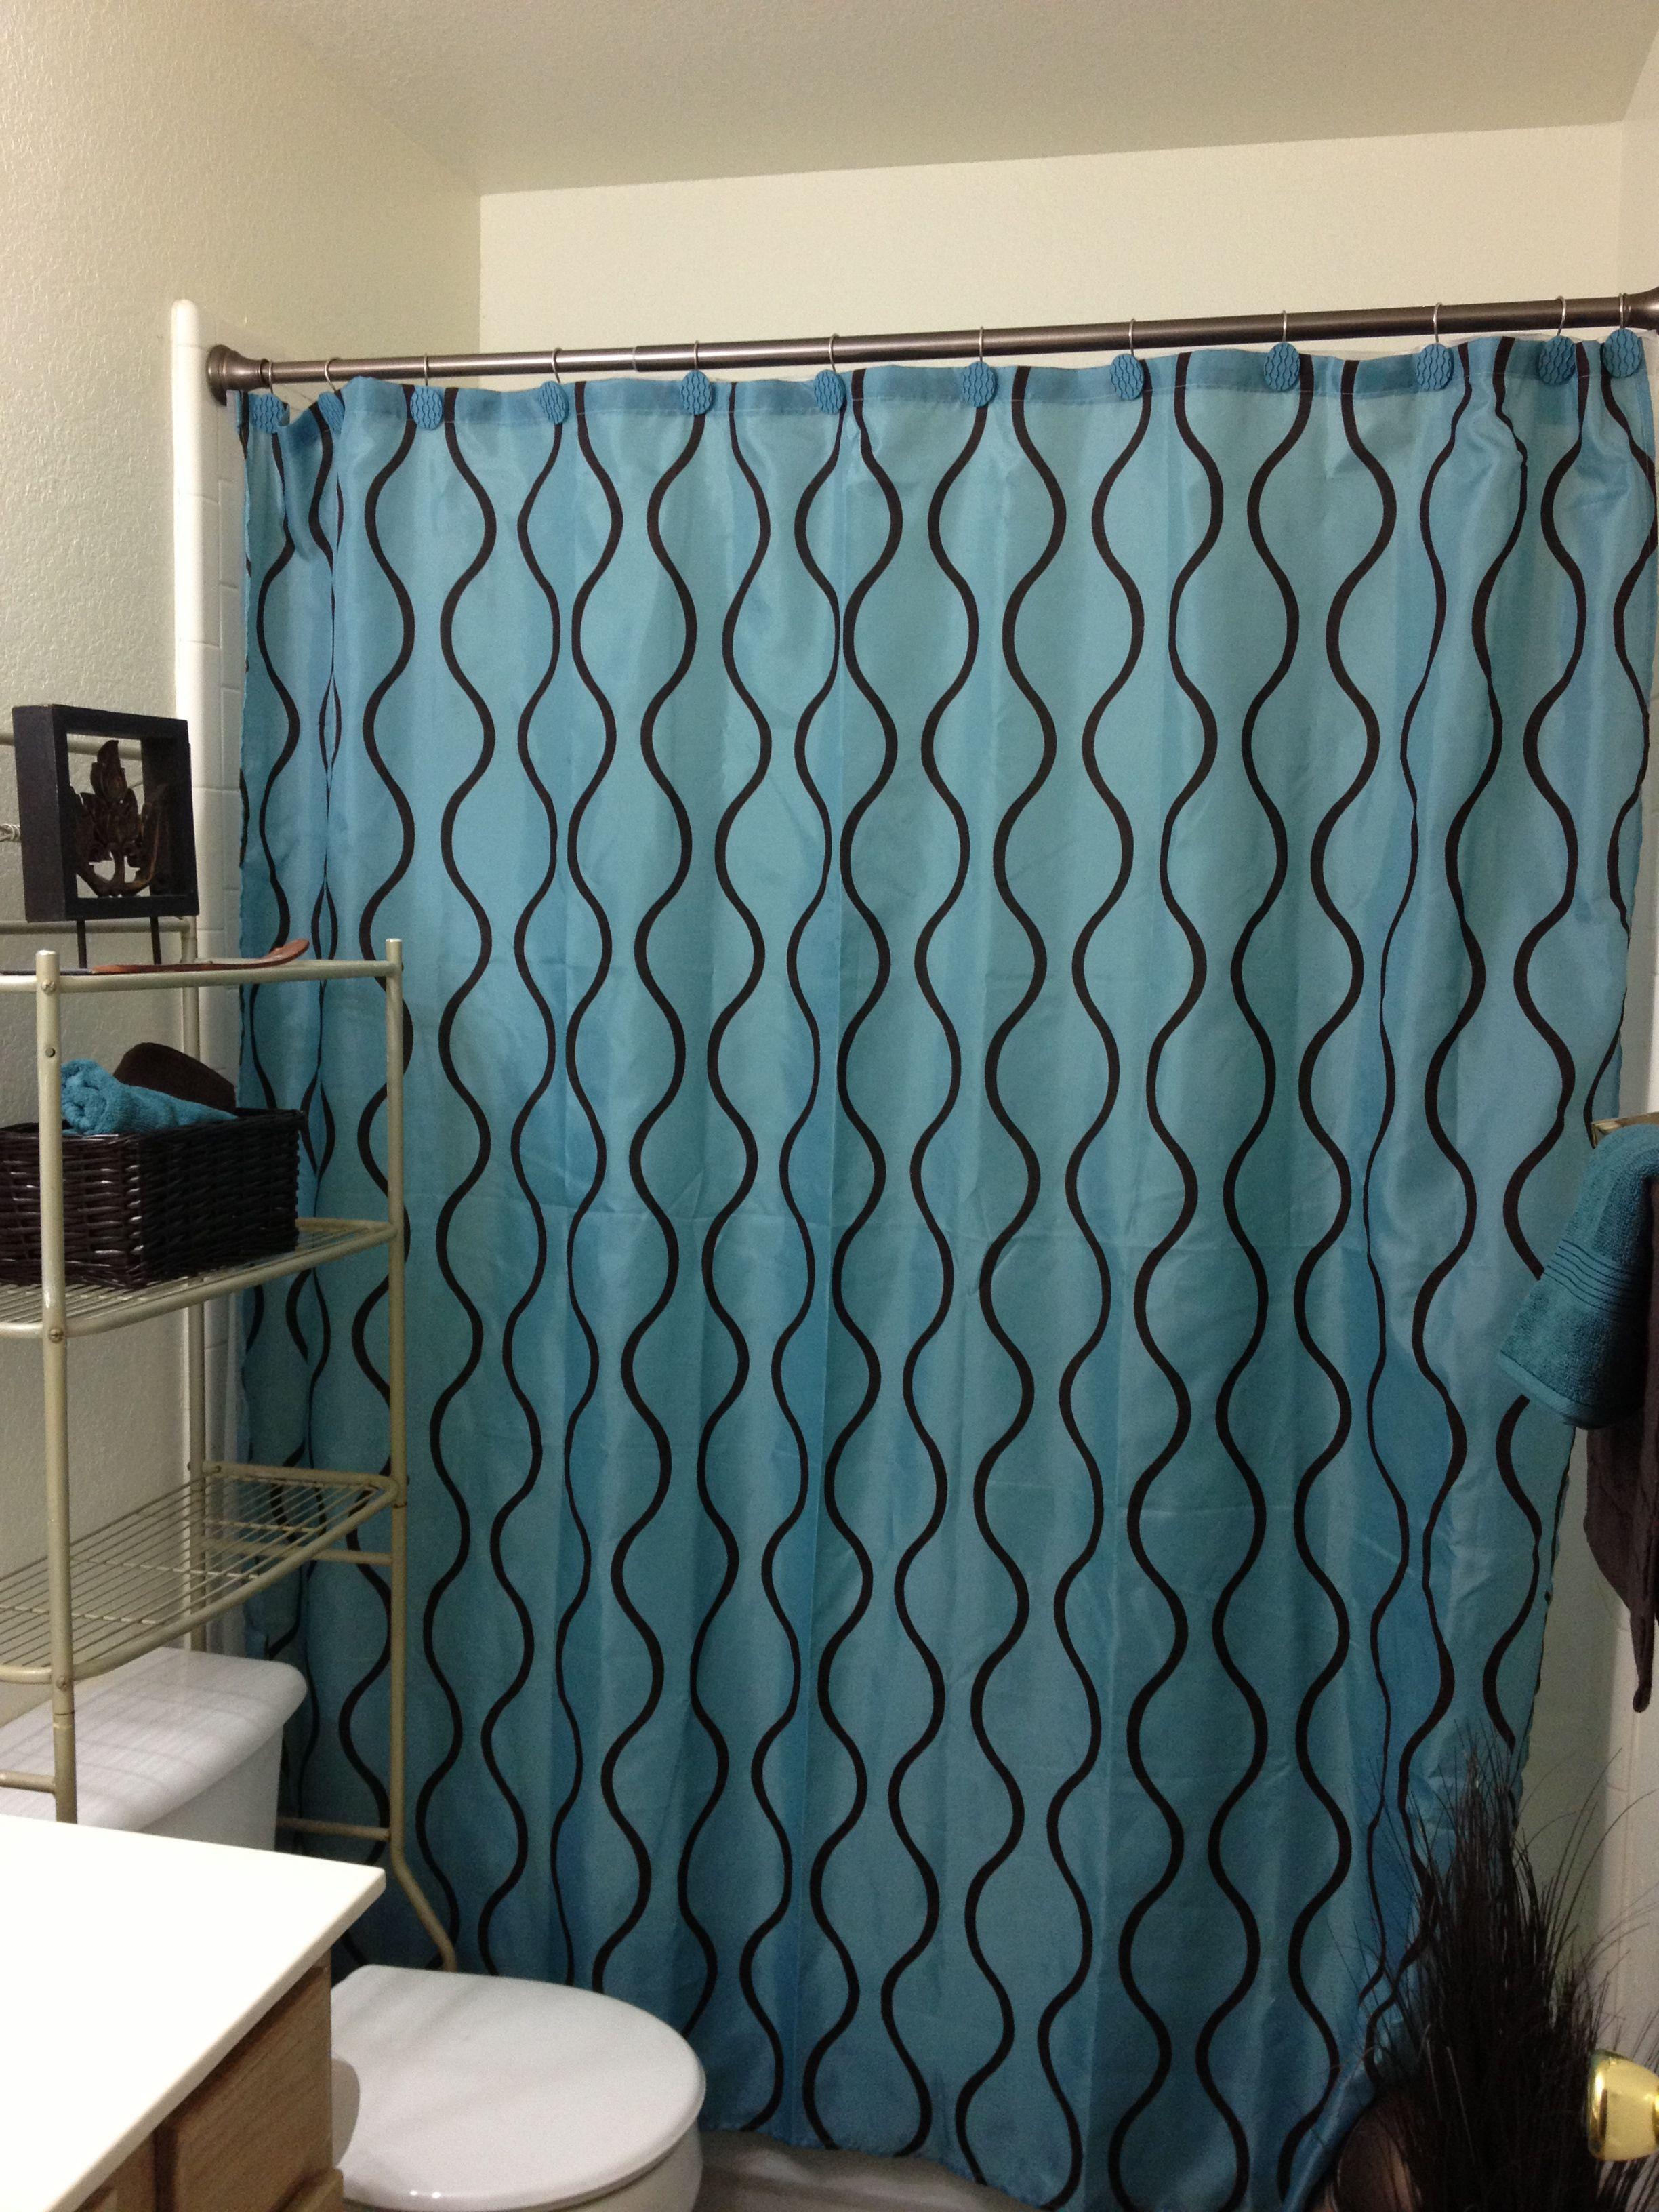 Teal Brown Shower Curtain Teal Bathroom Decor Brown Bathroom